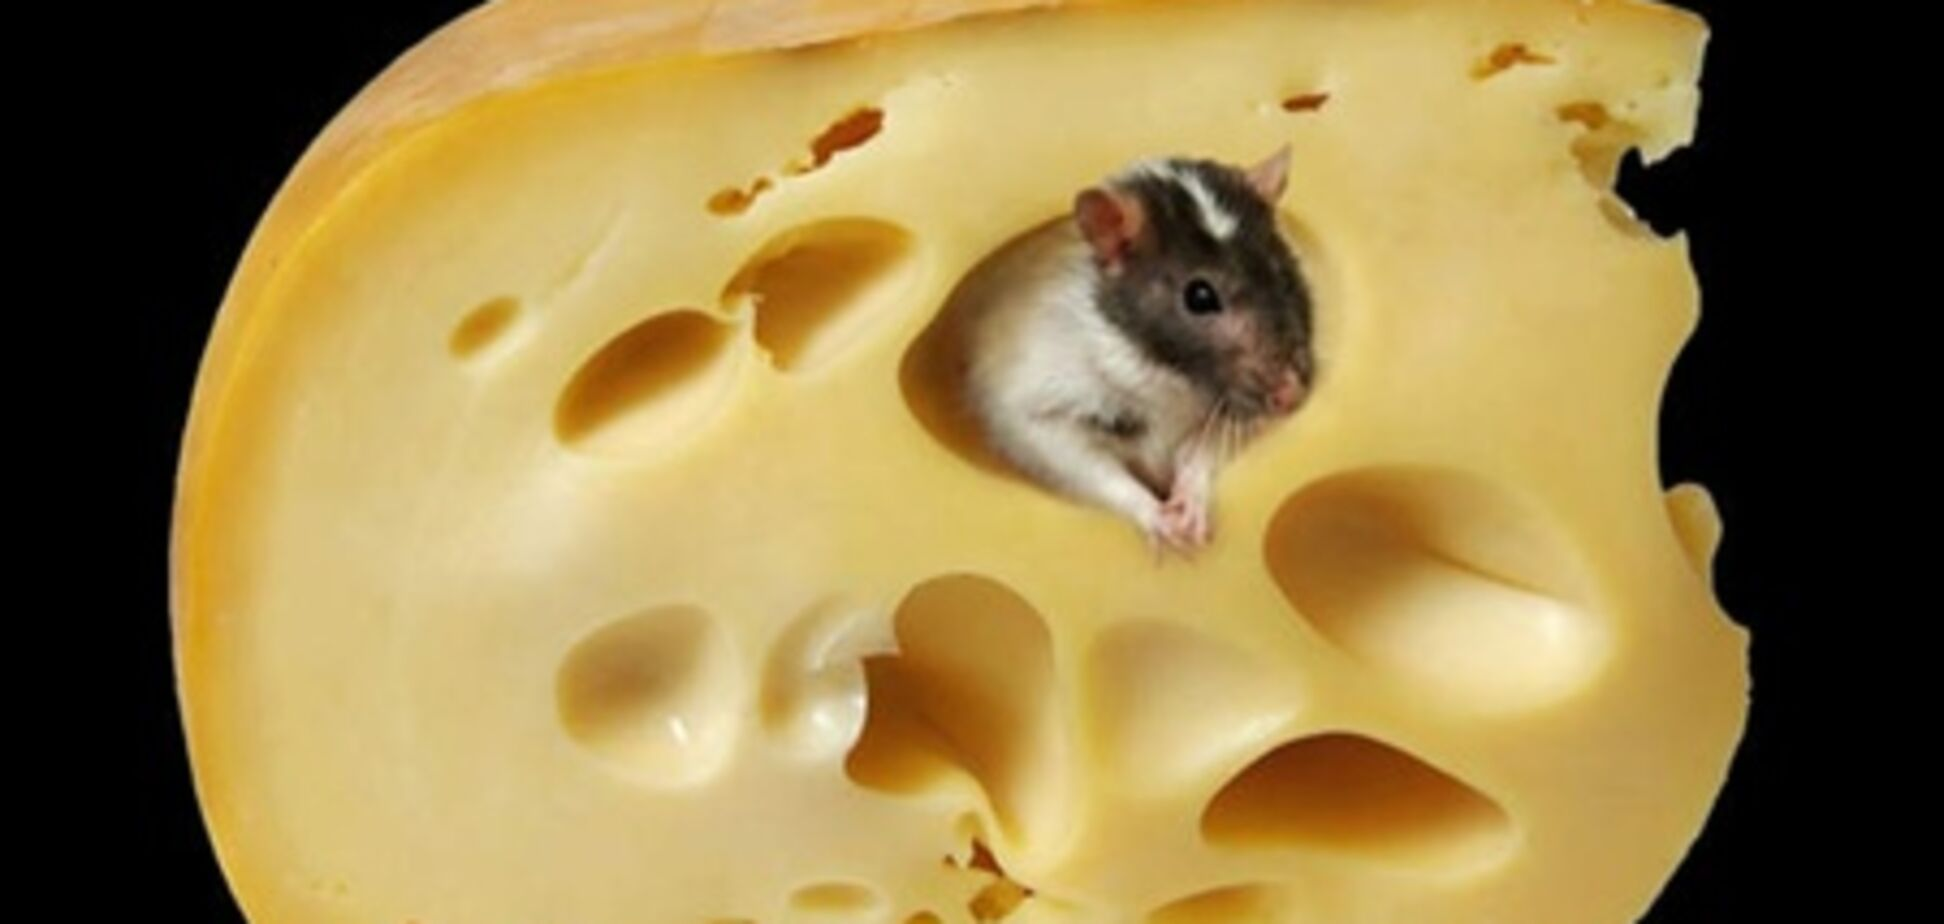 Київ попросить Москву довести погану якість сиру